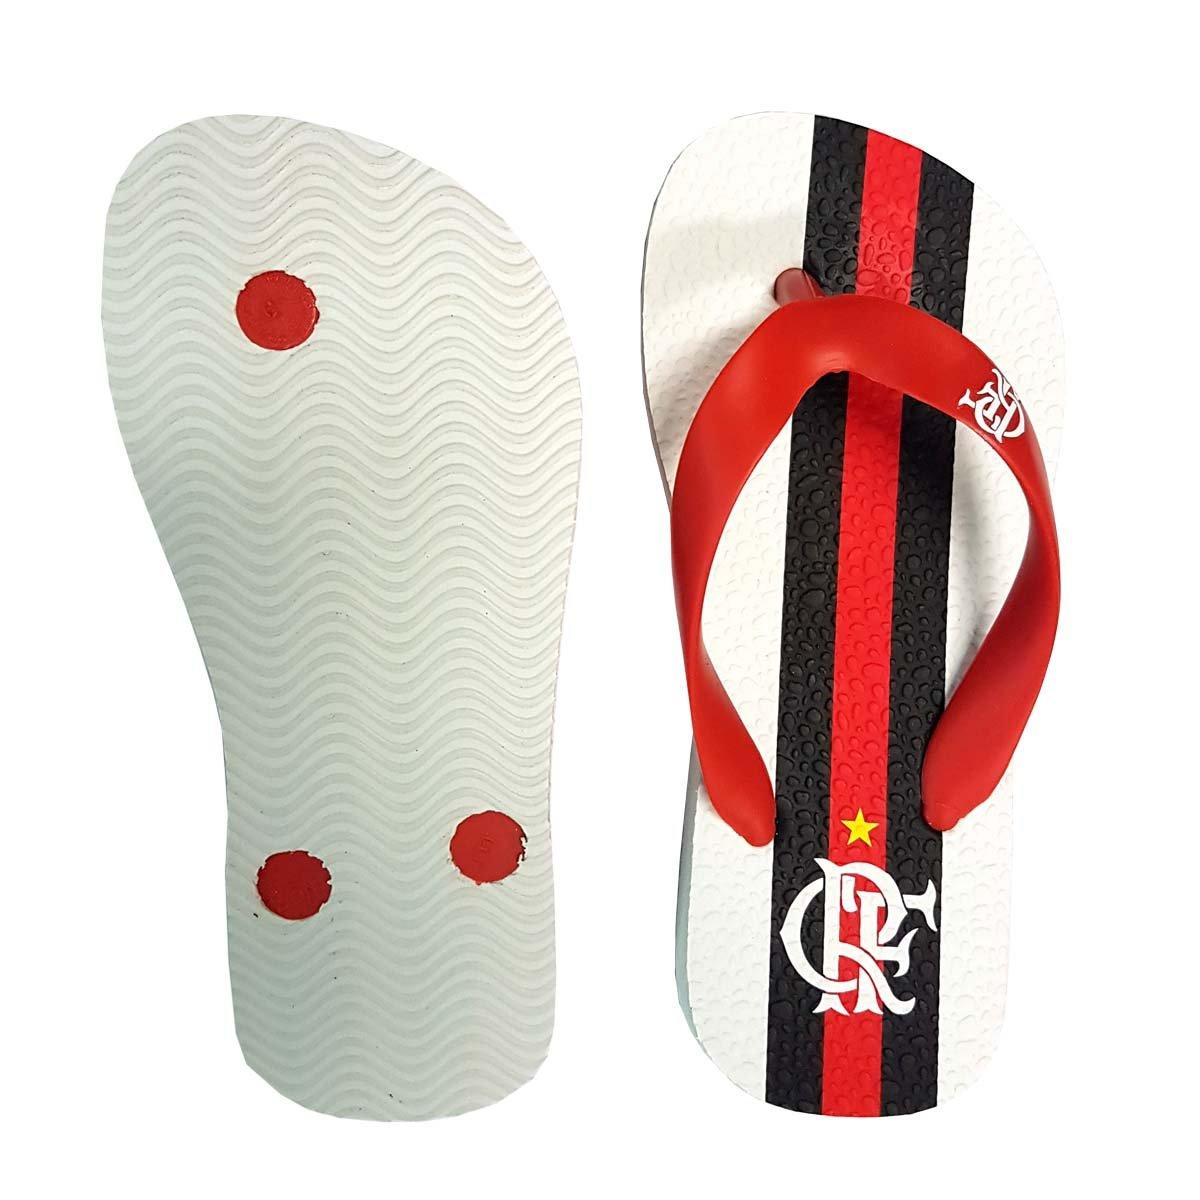 2 Chinelo Flamengo 2017 Infantil Flamengo Branco Manto Chinelo Branco 7XwxdP6